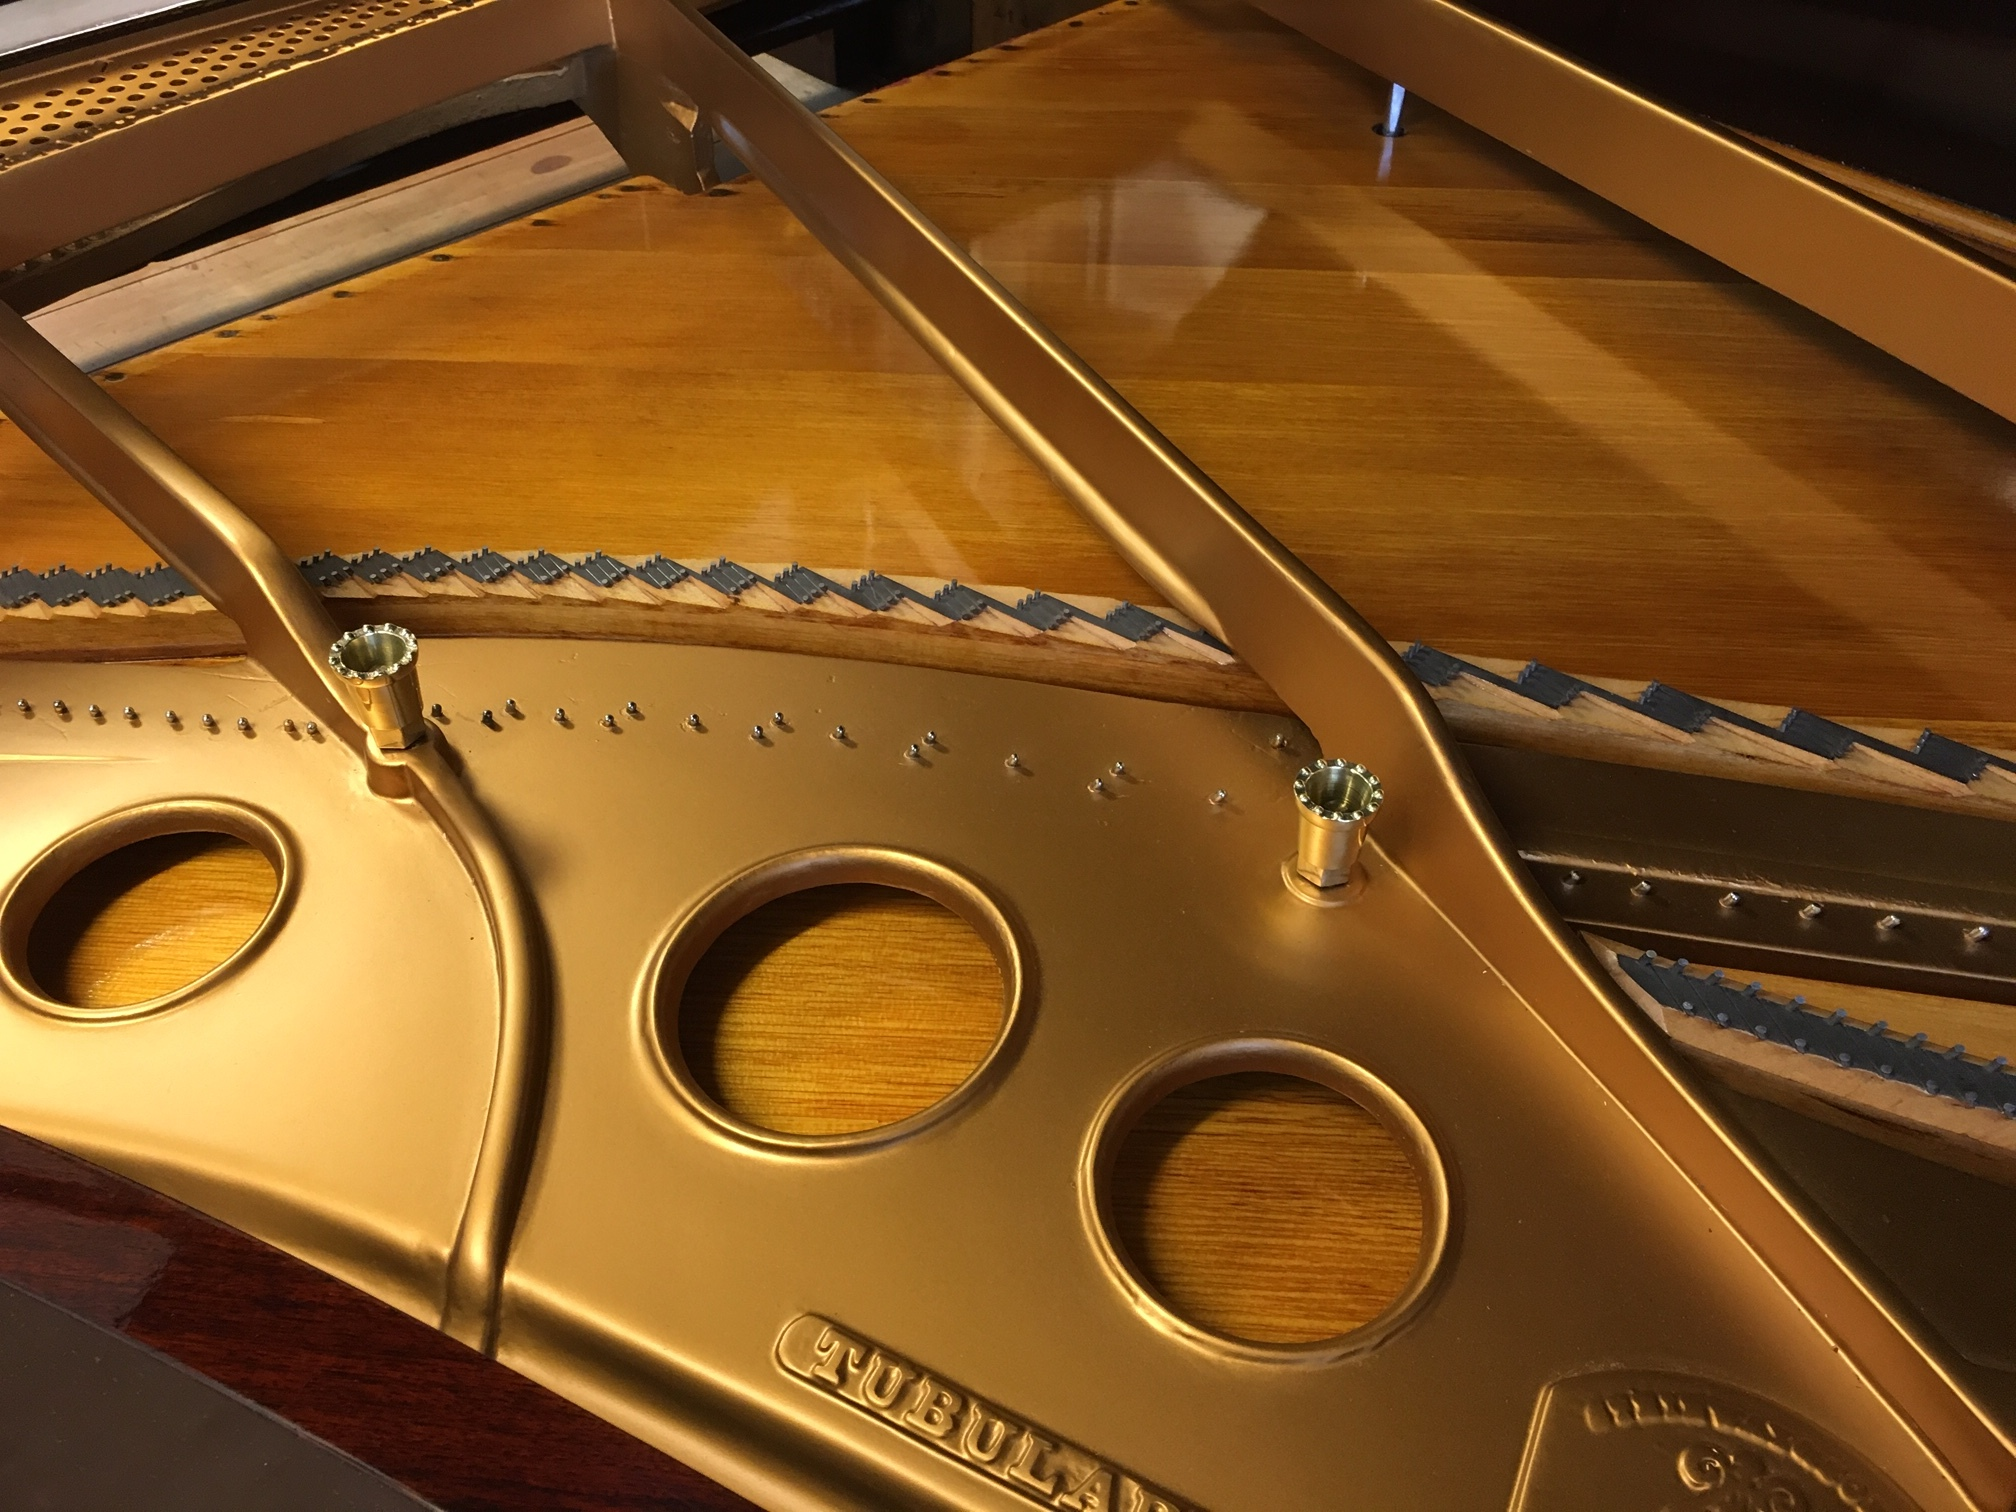 Plate re-gilded, soundboard prepared,   prior to stringing.